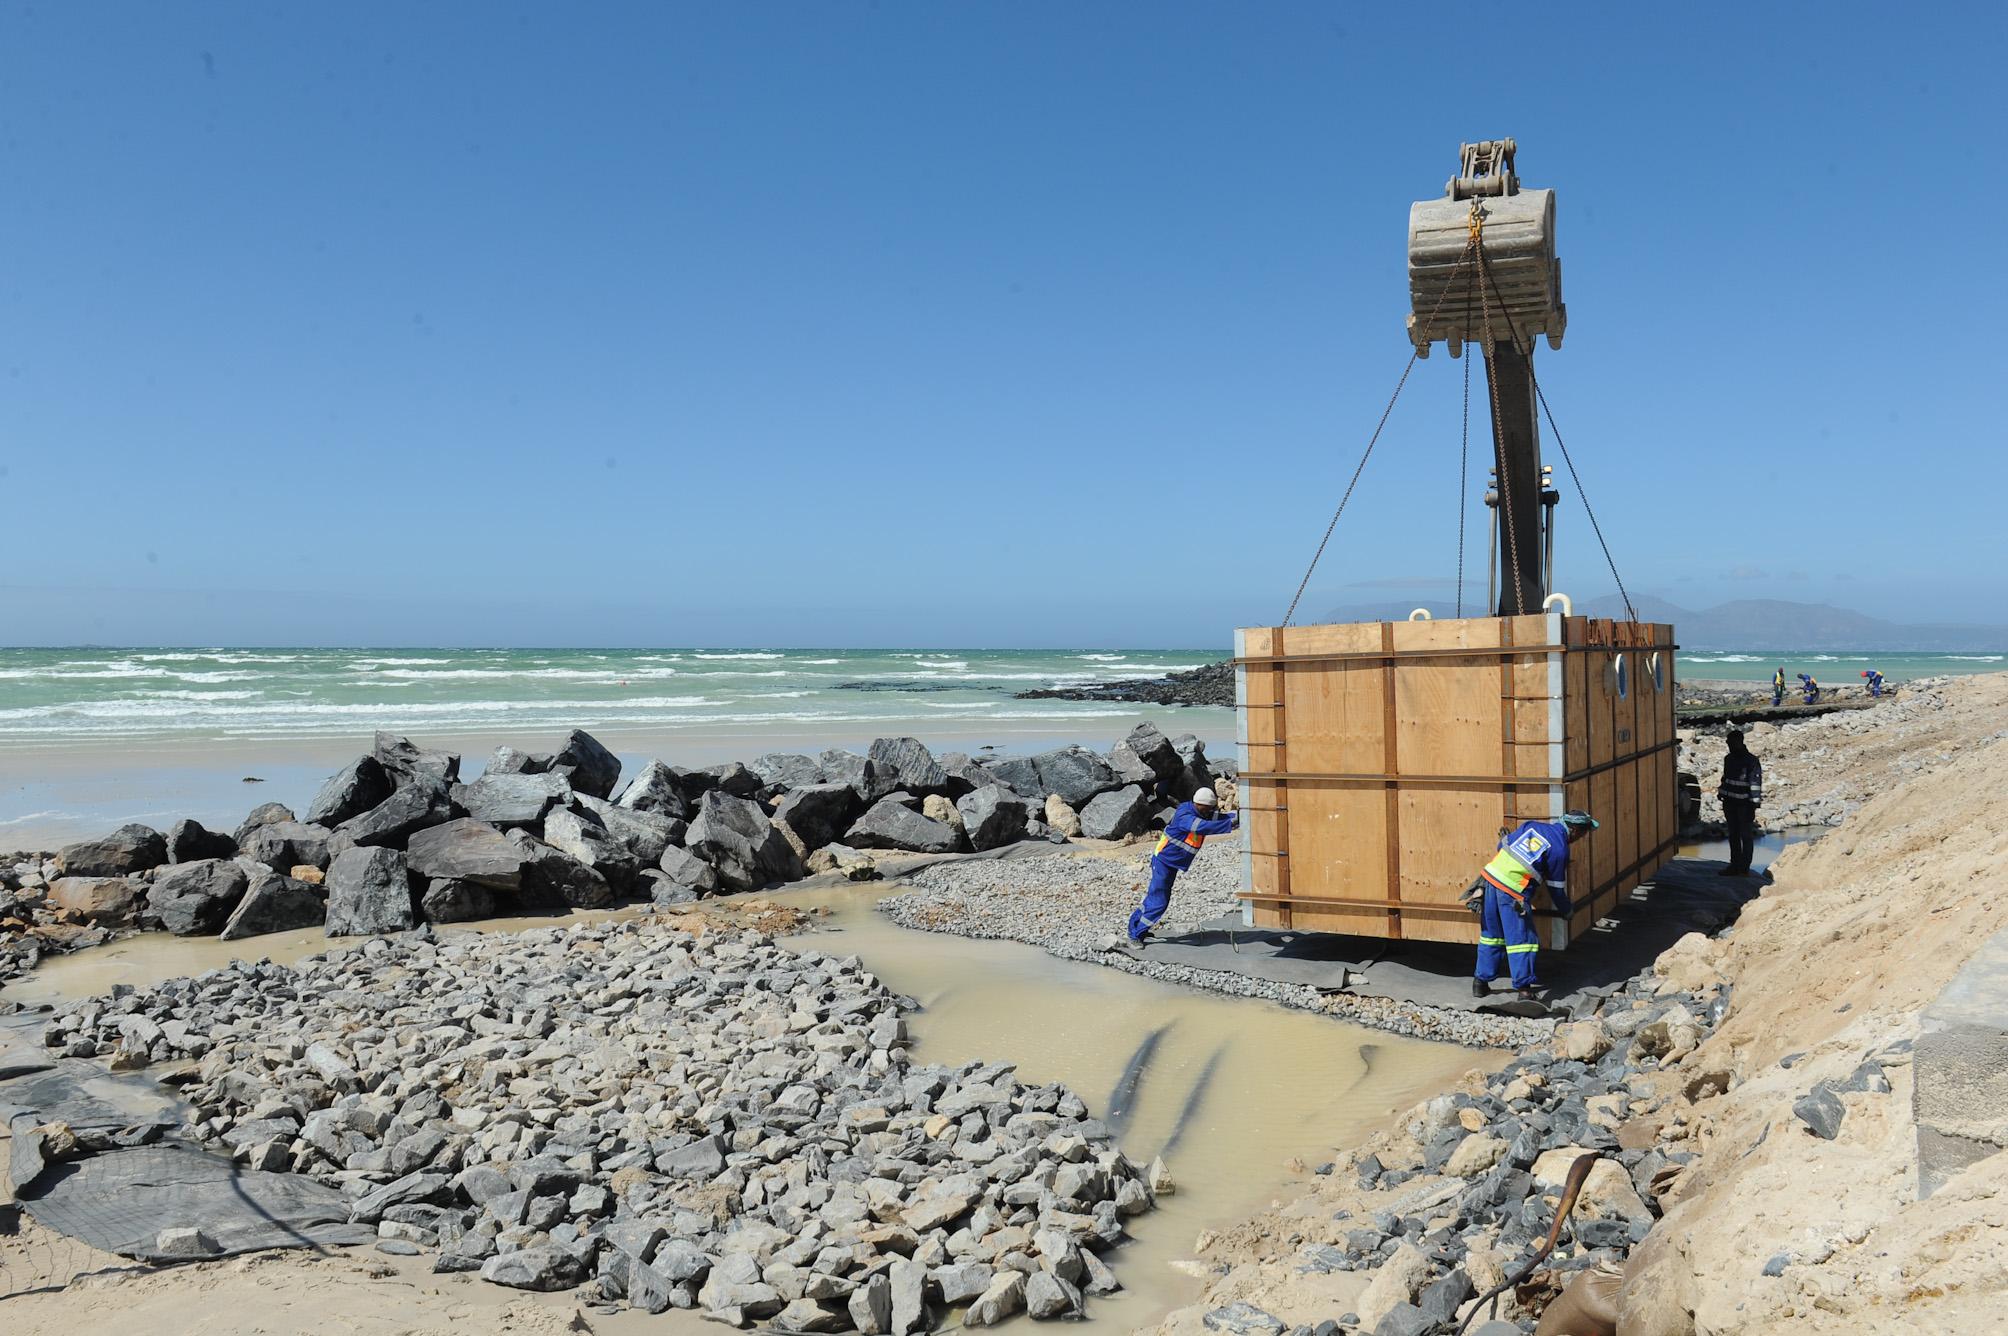 PHOTOS Desalination plant Monwabisi & Strandfontein Pavillion